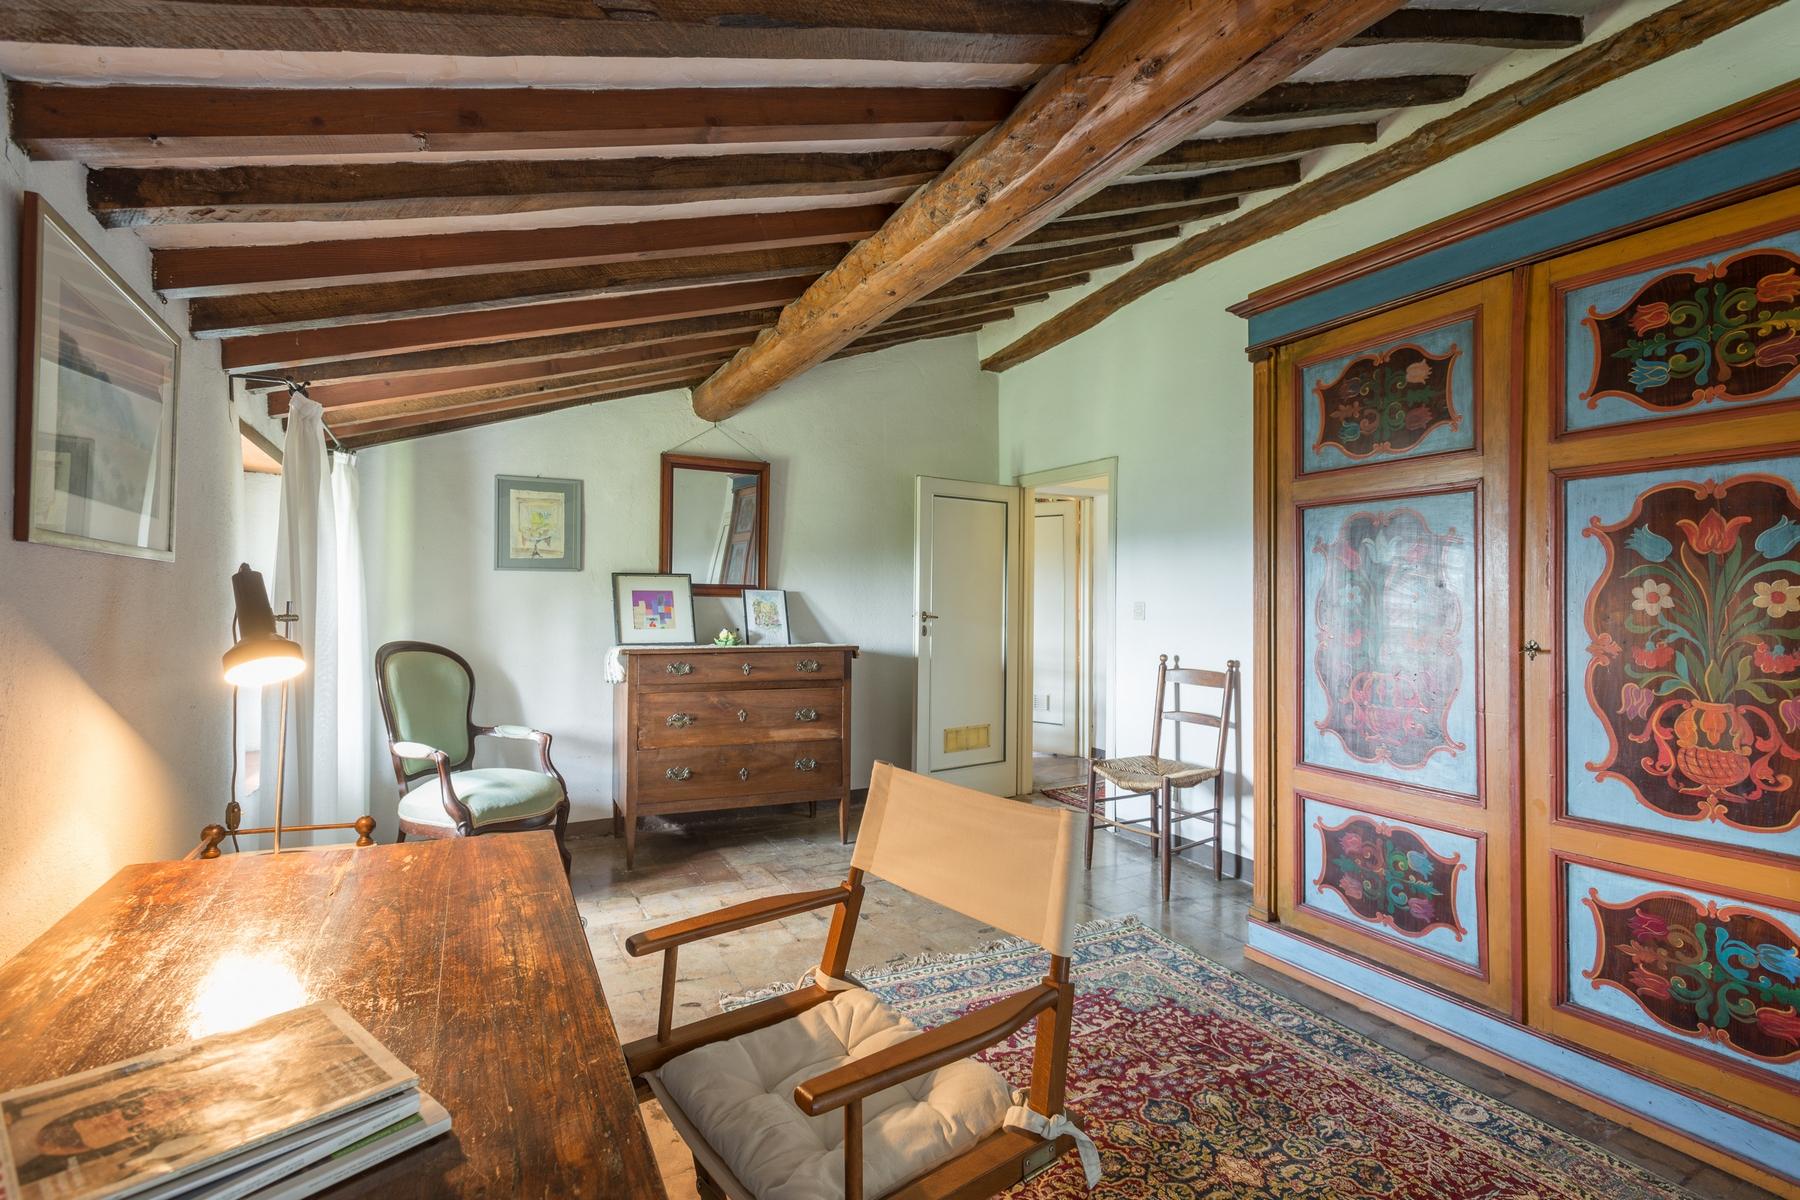 Villa in Vendita a Lucca: 5 locali, 550 mq - Foto 14